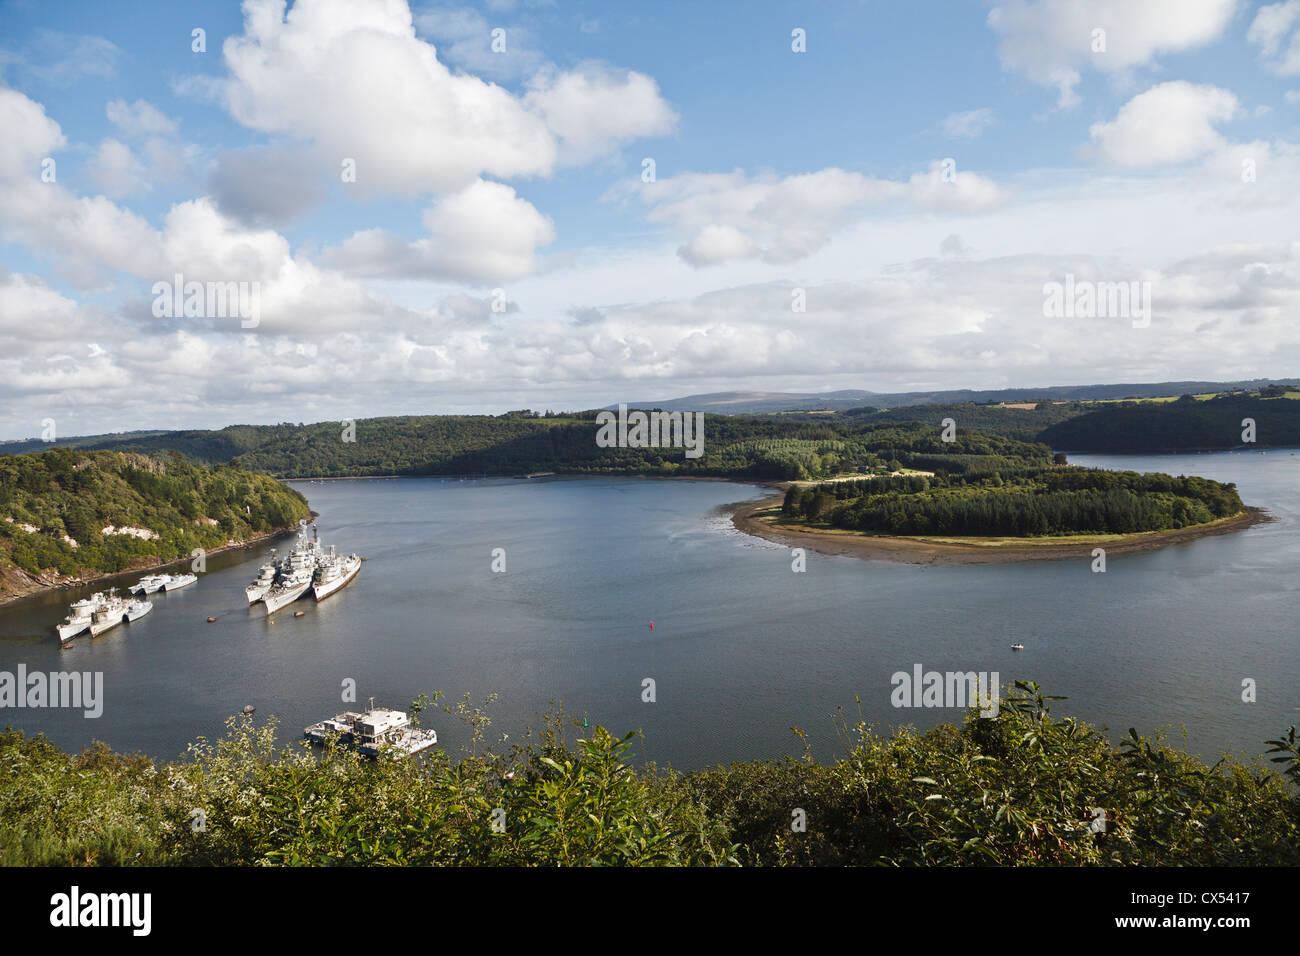 Friedhof der Schiffe auf dem Fluss Aulne nahe Landévennec, Finistère, Bretagne, Frankreich Stockbild